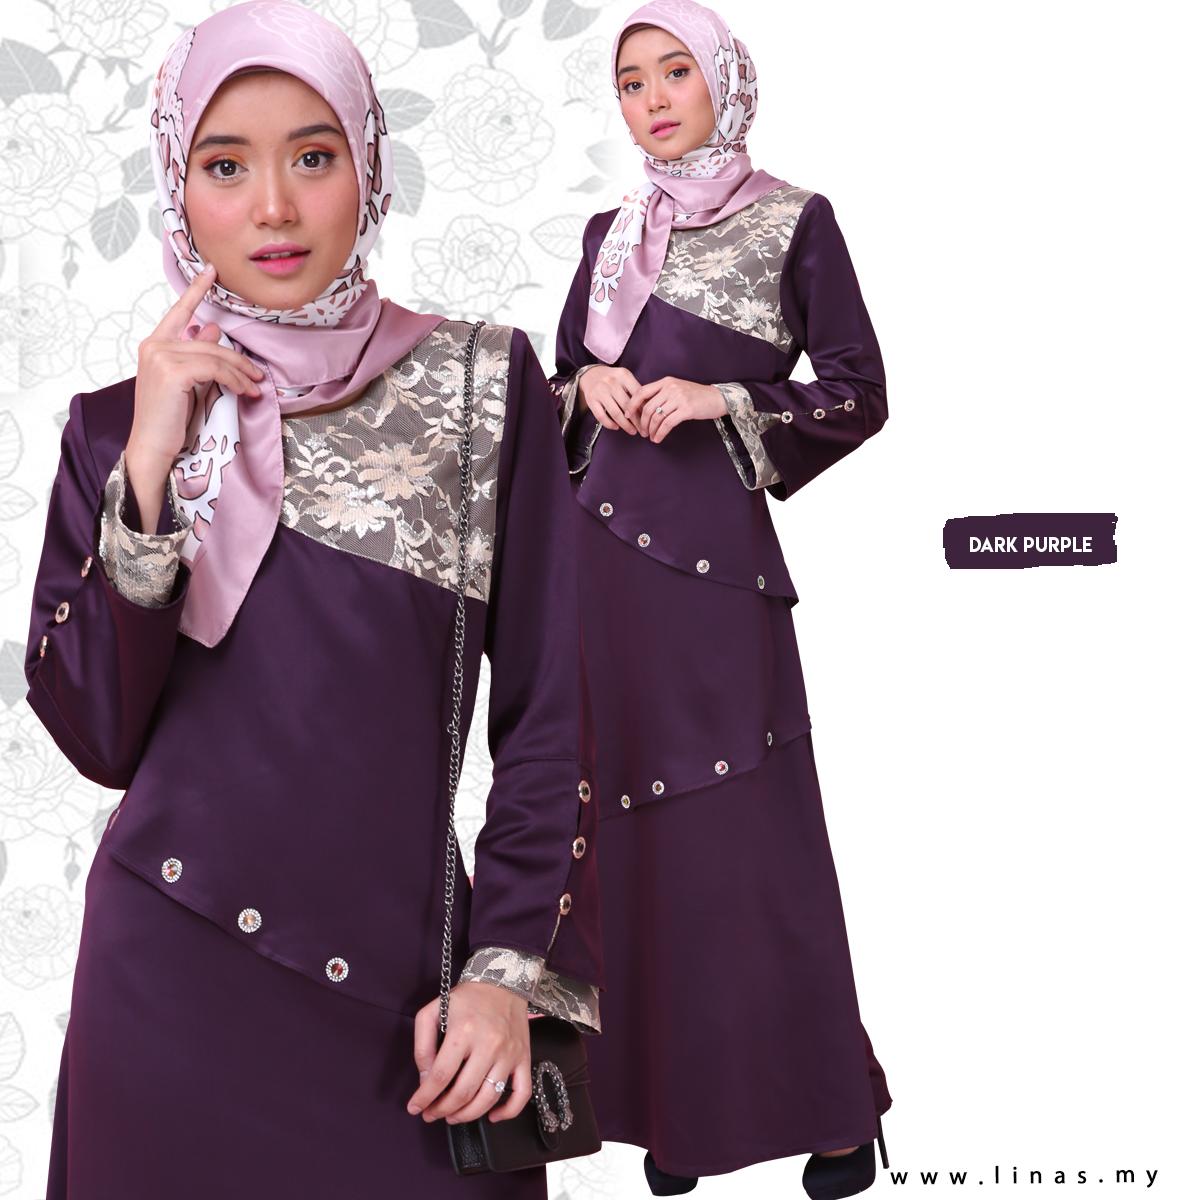 Muslimah Jubah Moden KHALISHA by LINAS FASHION for Umrah / Casual Wear / Office Wear - Ready Stock